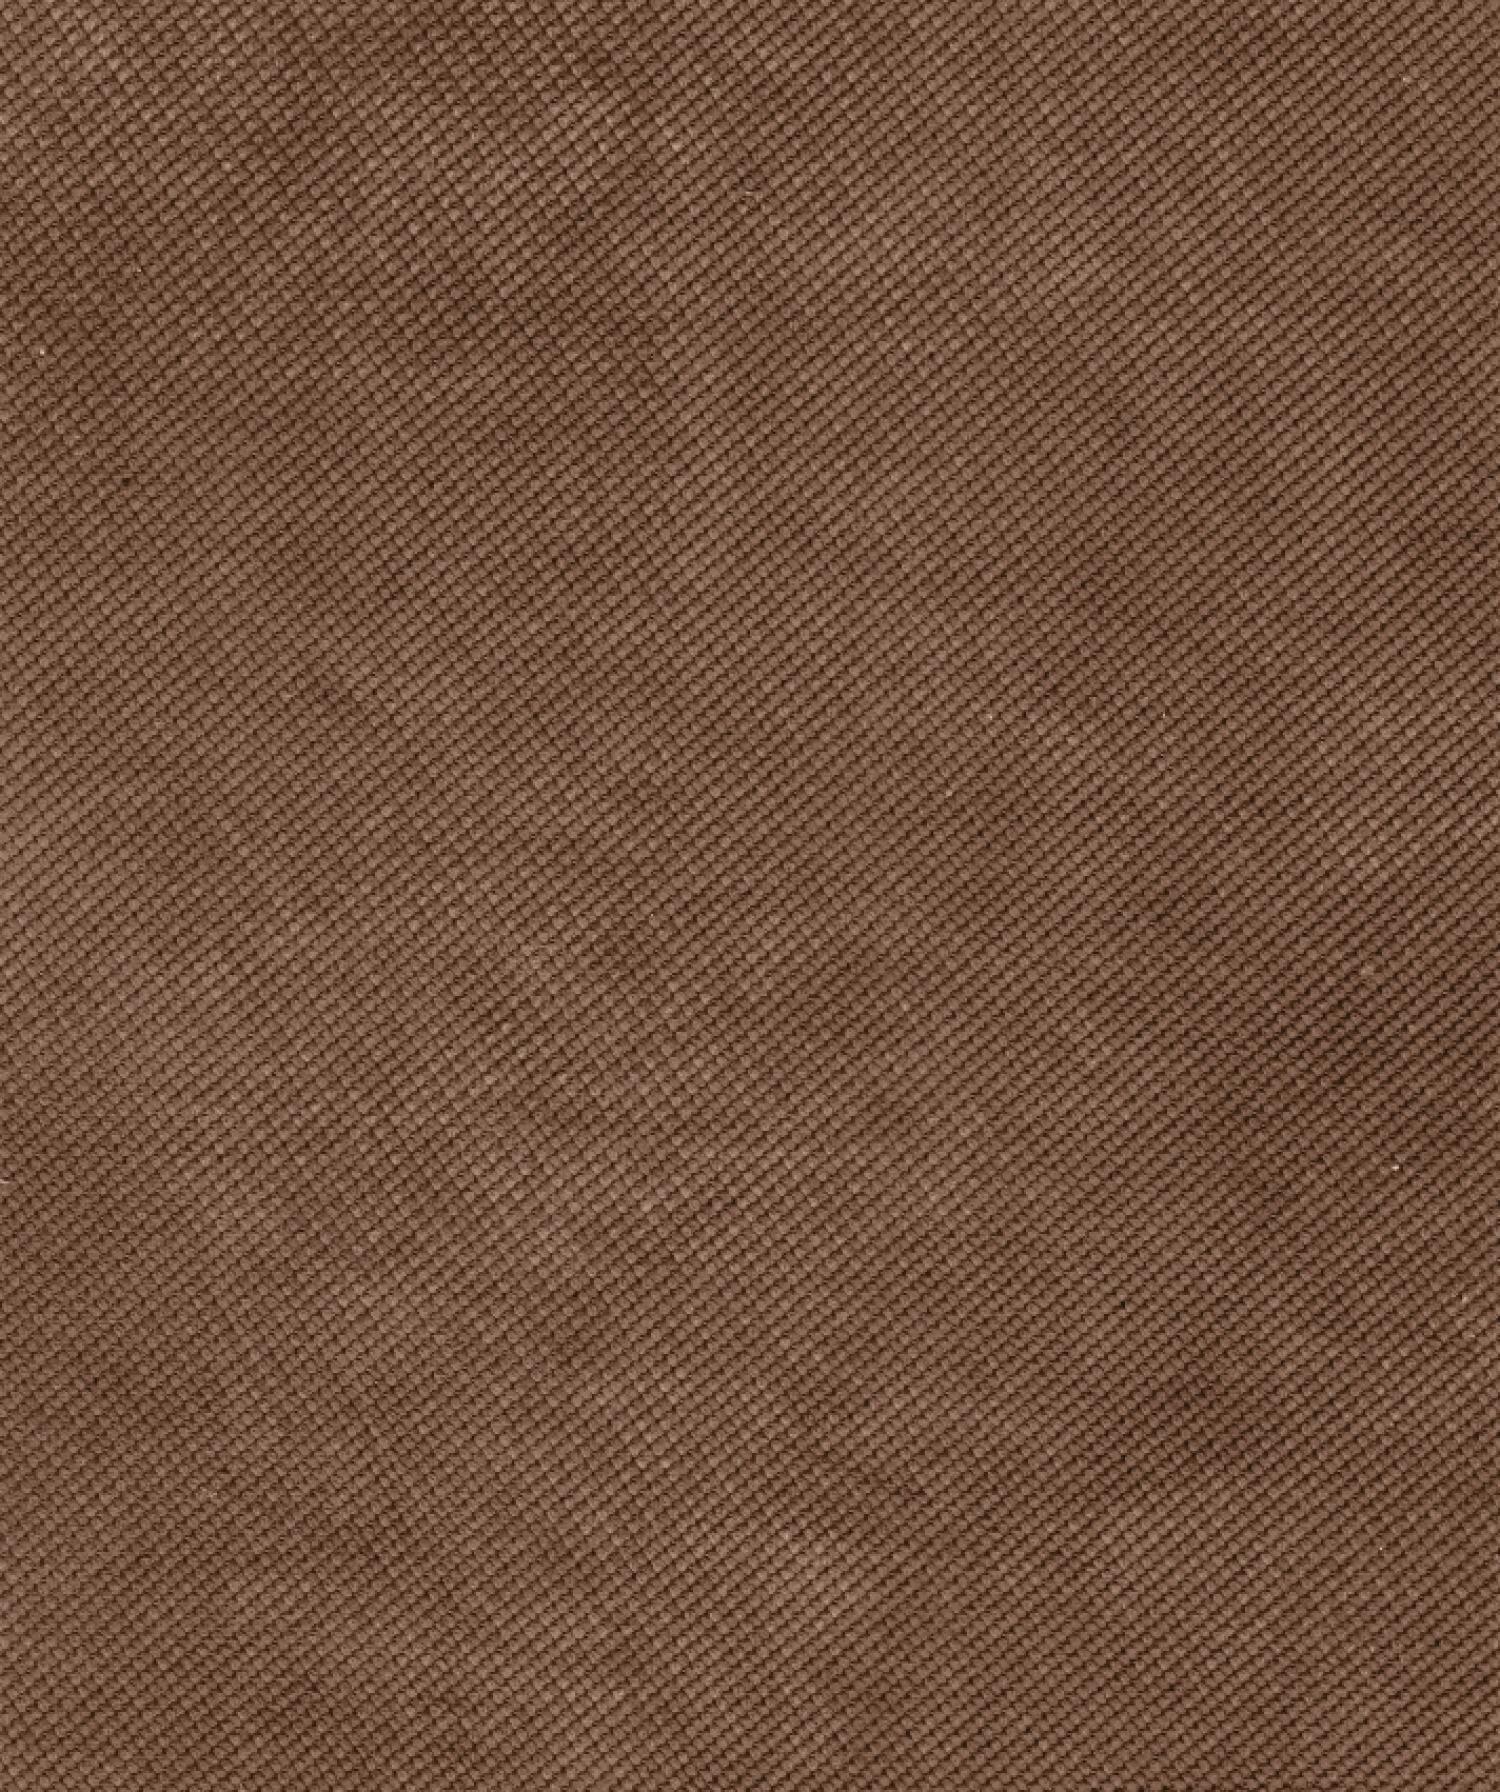 Verona 74(744) Dark Brown